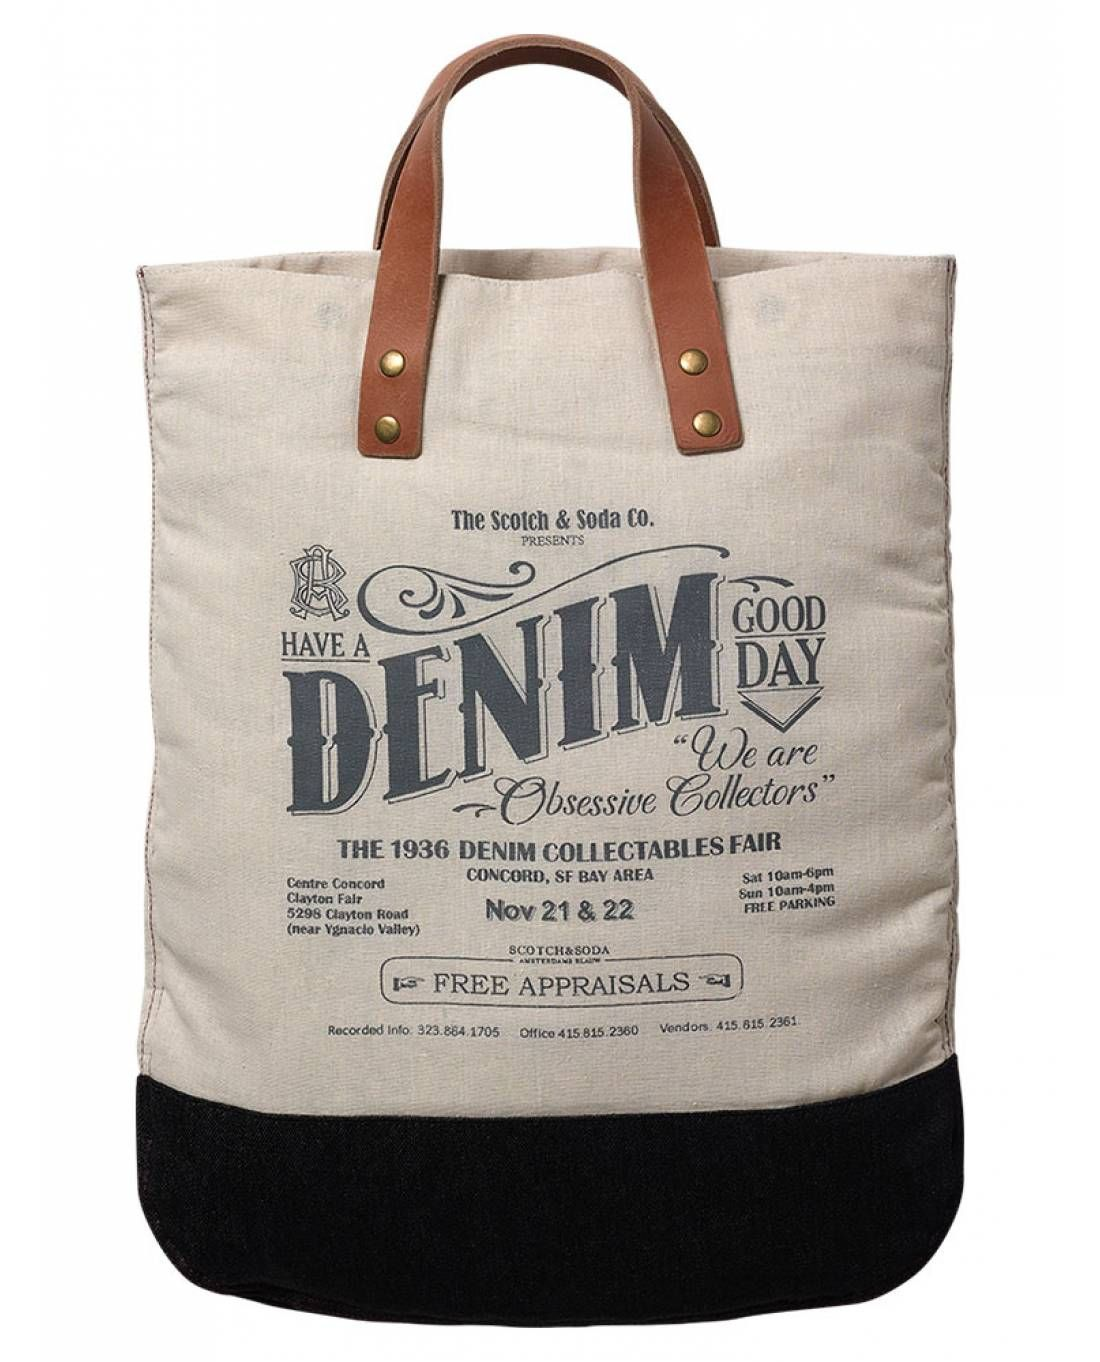 Shopper - Bags   Handbags - Official Scotch   Soda Online Fashion   Apparel  Shops 1284228600